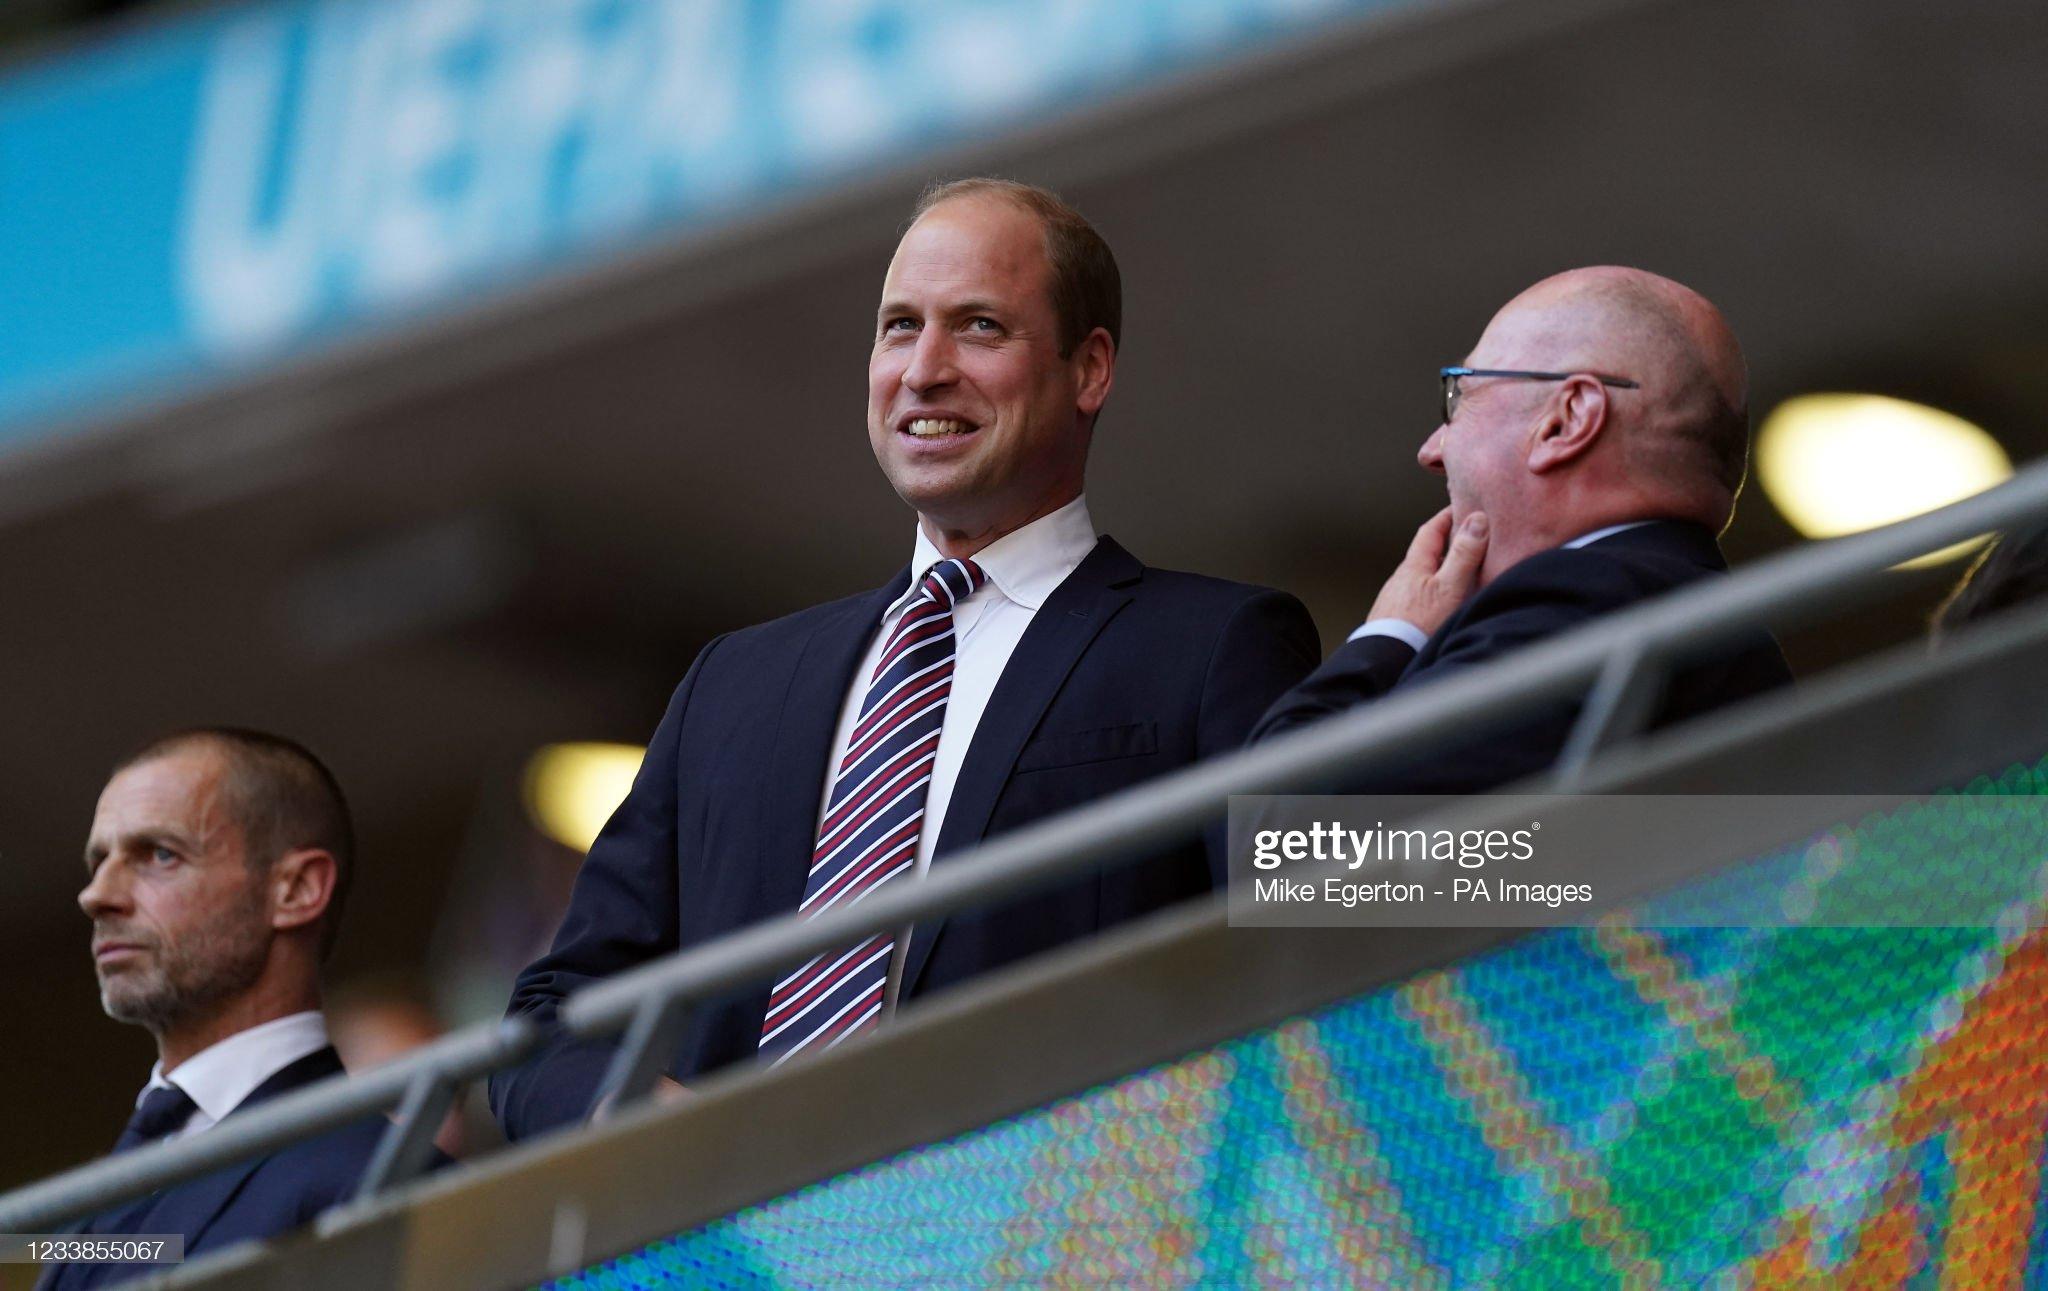 England v Denmark - UEFA Euro 2020 - Semi Final - Wembley Stadium : News Photo